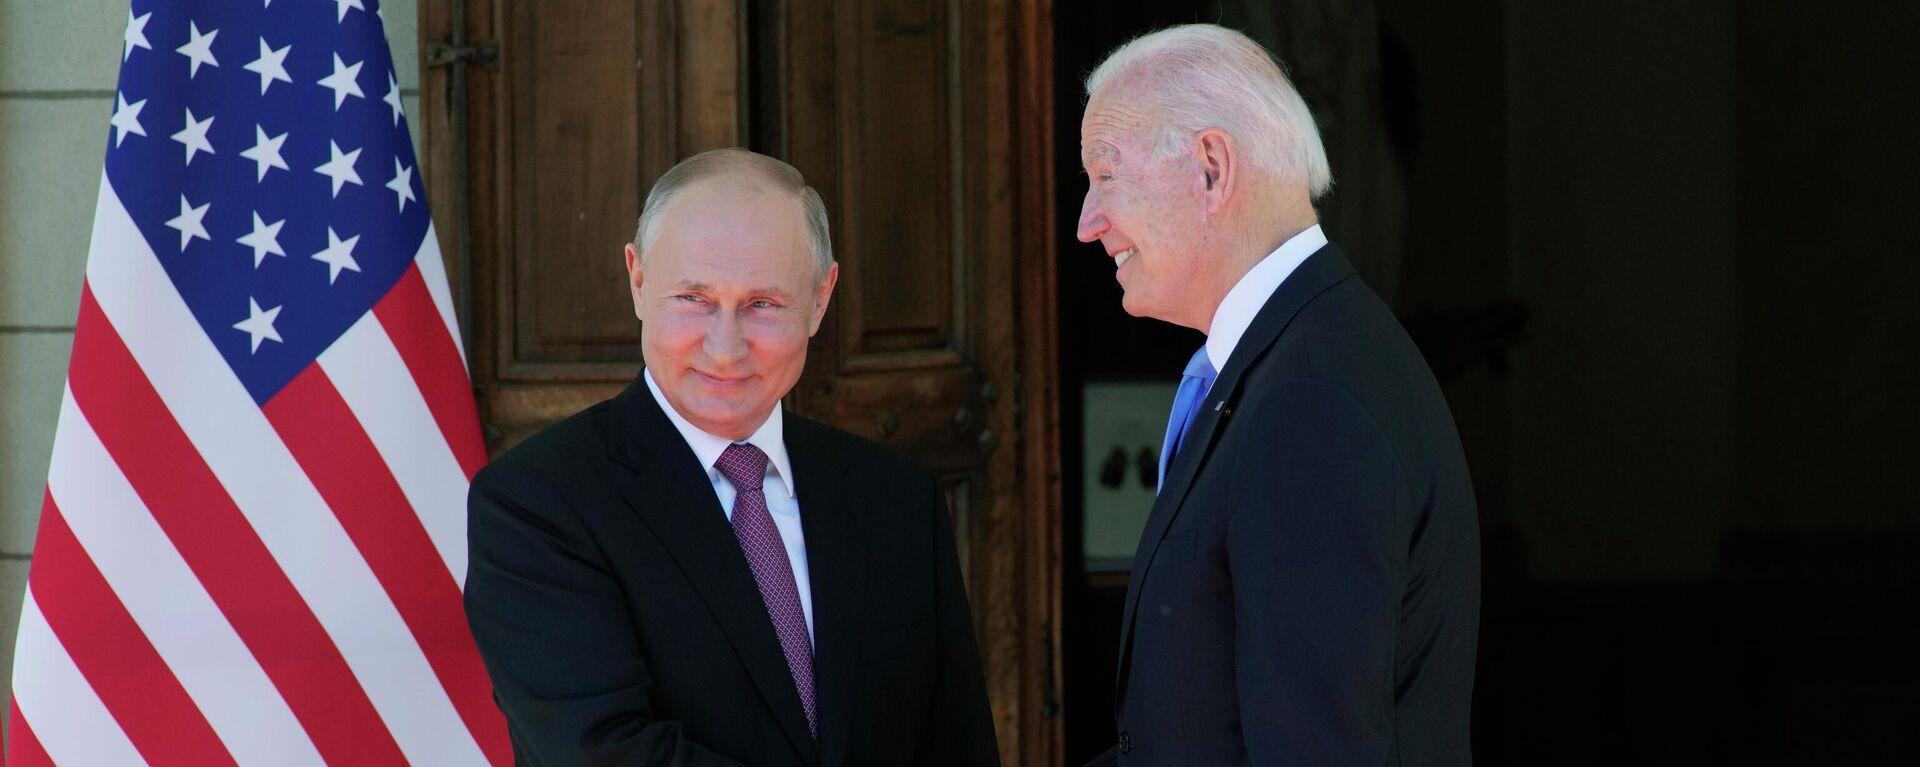 Рукопожатие президента России Владимира Путина и президента США Джо Байдена - Sputnik Таджикистан, 1920, 16.06.2021